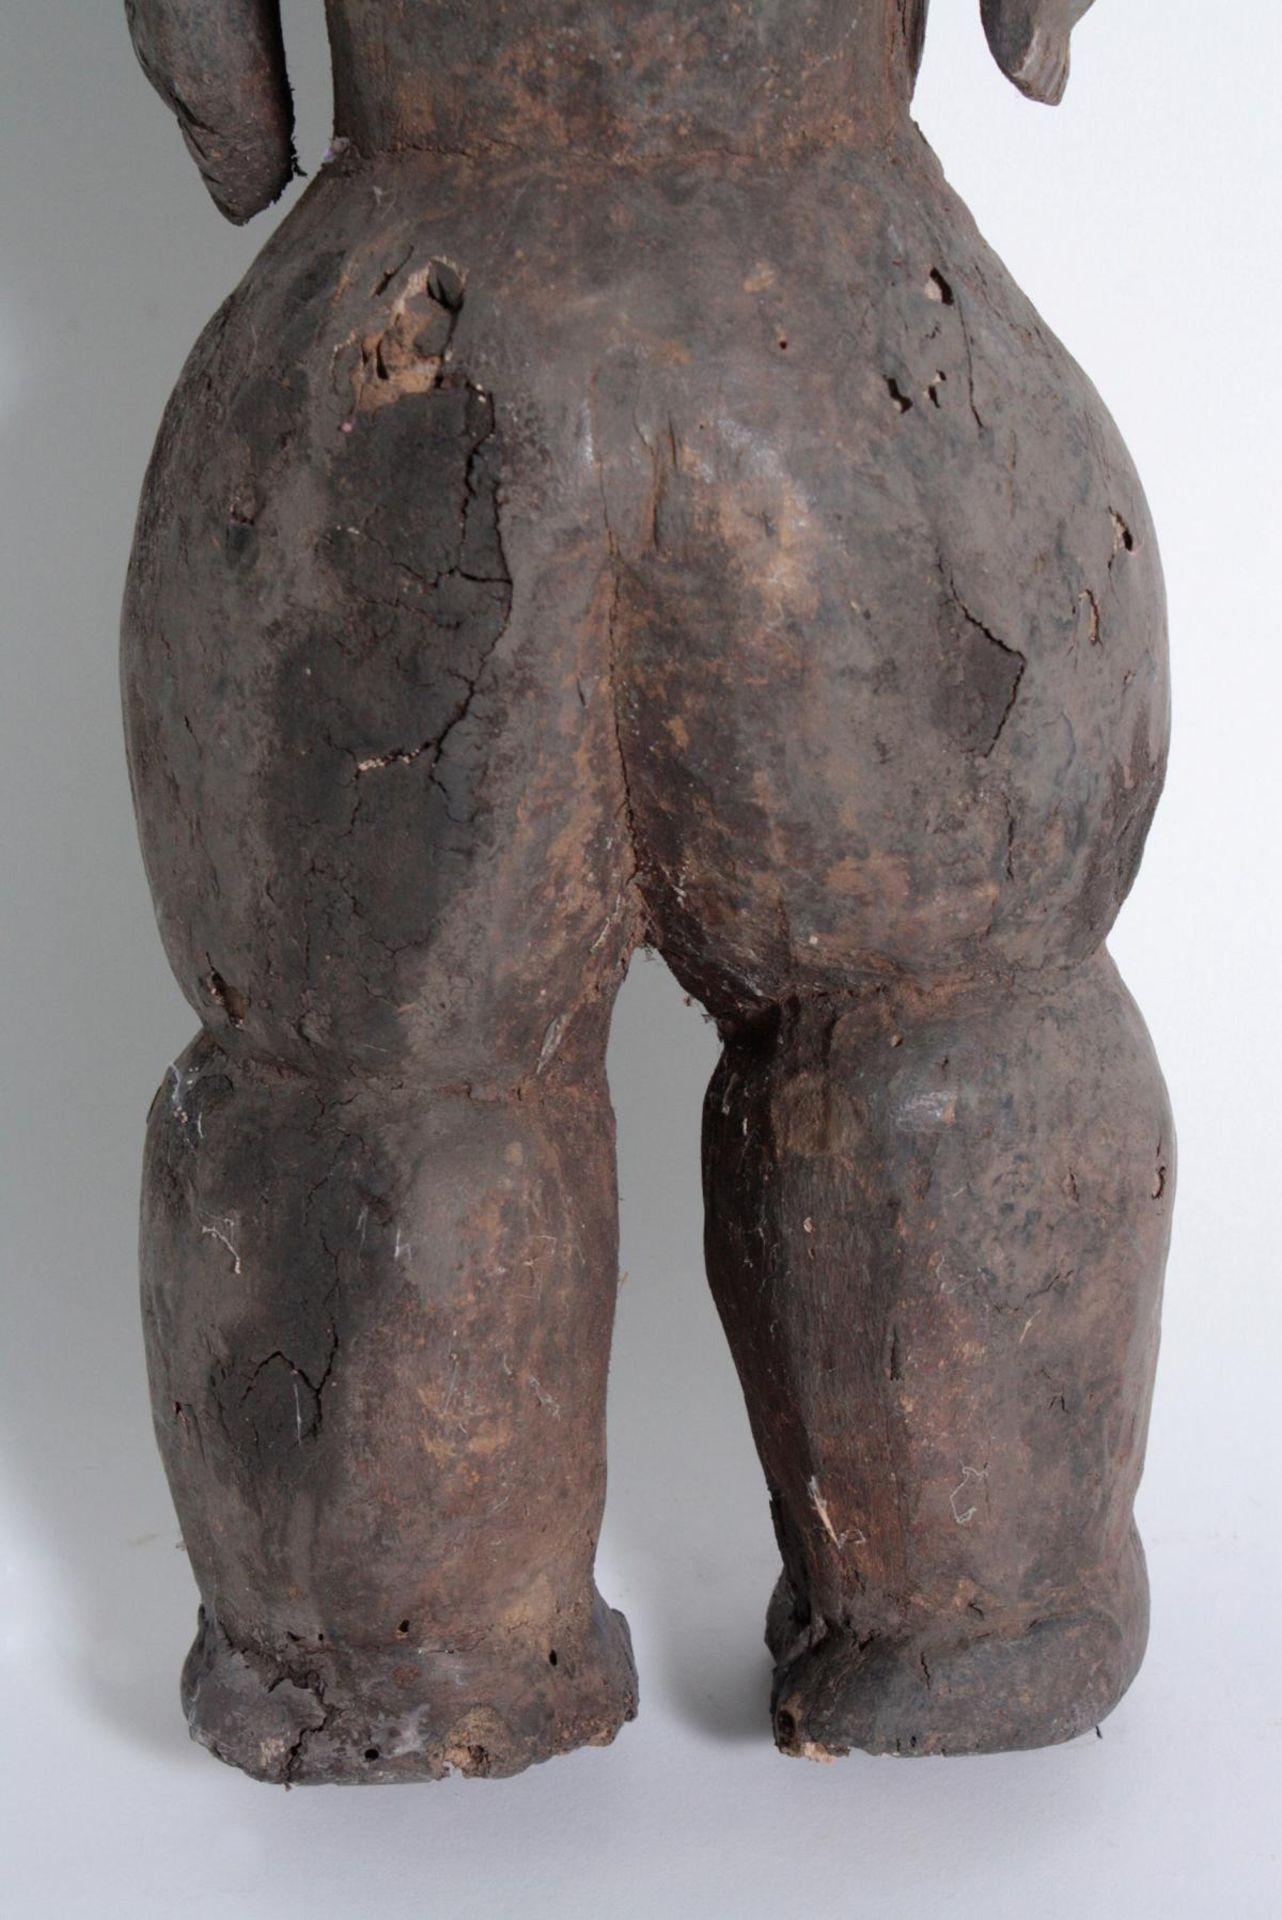 Ältere Ahnen-Figur, Tabwa, D. R. Kongo - Bild 10 aus 14